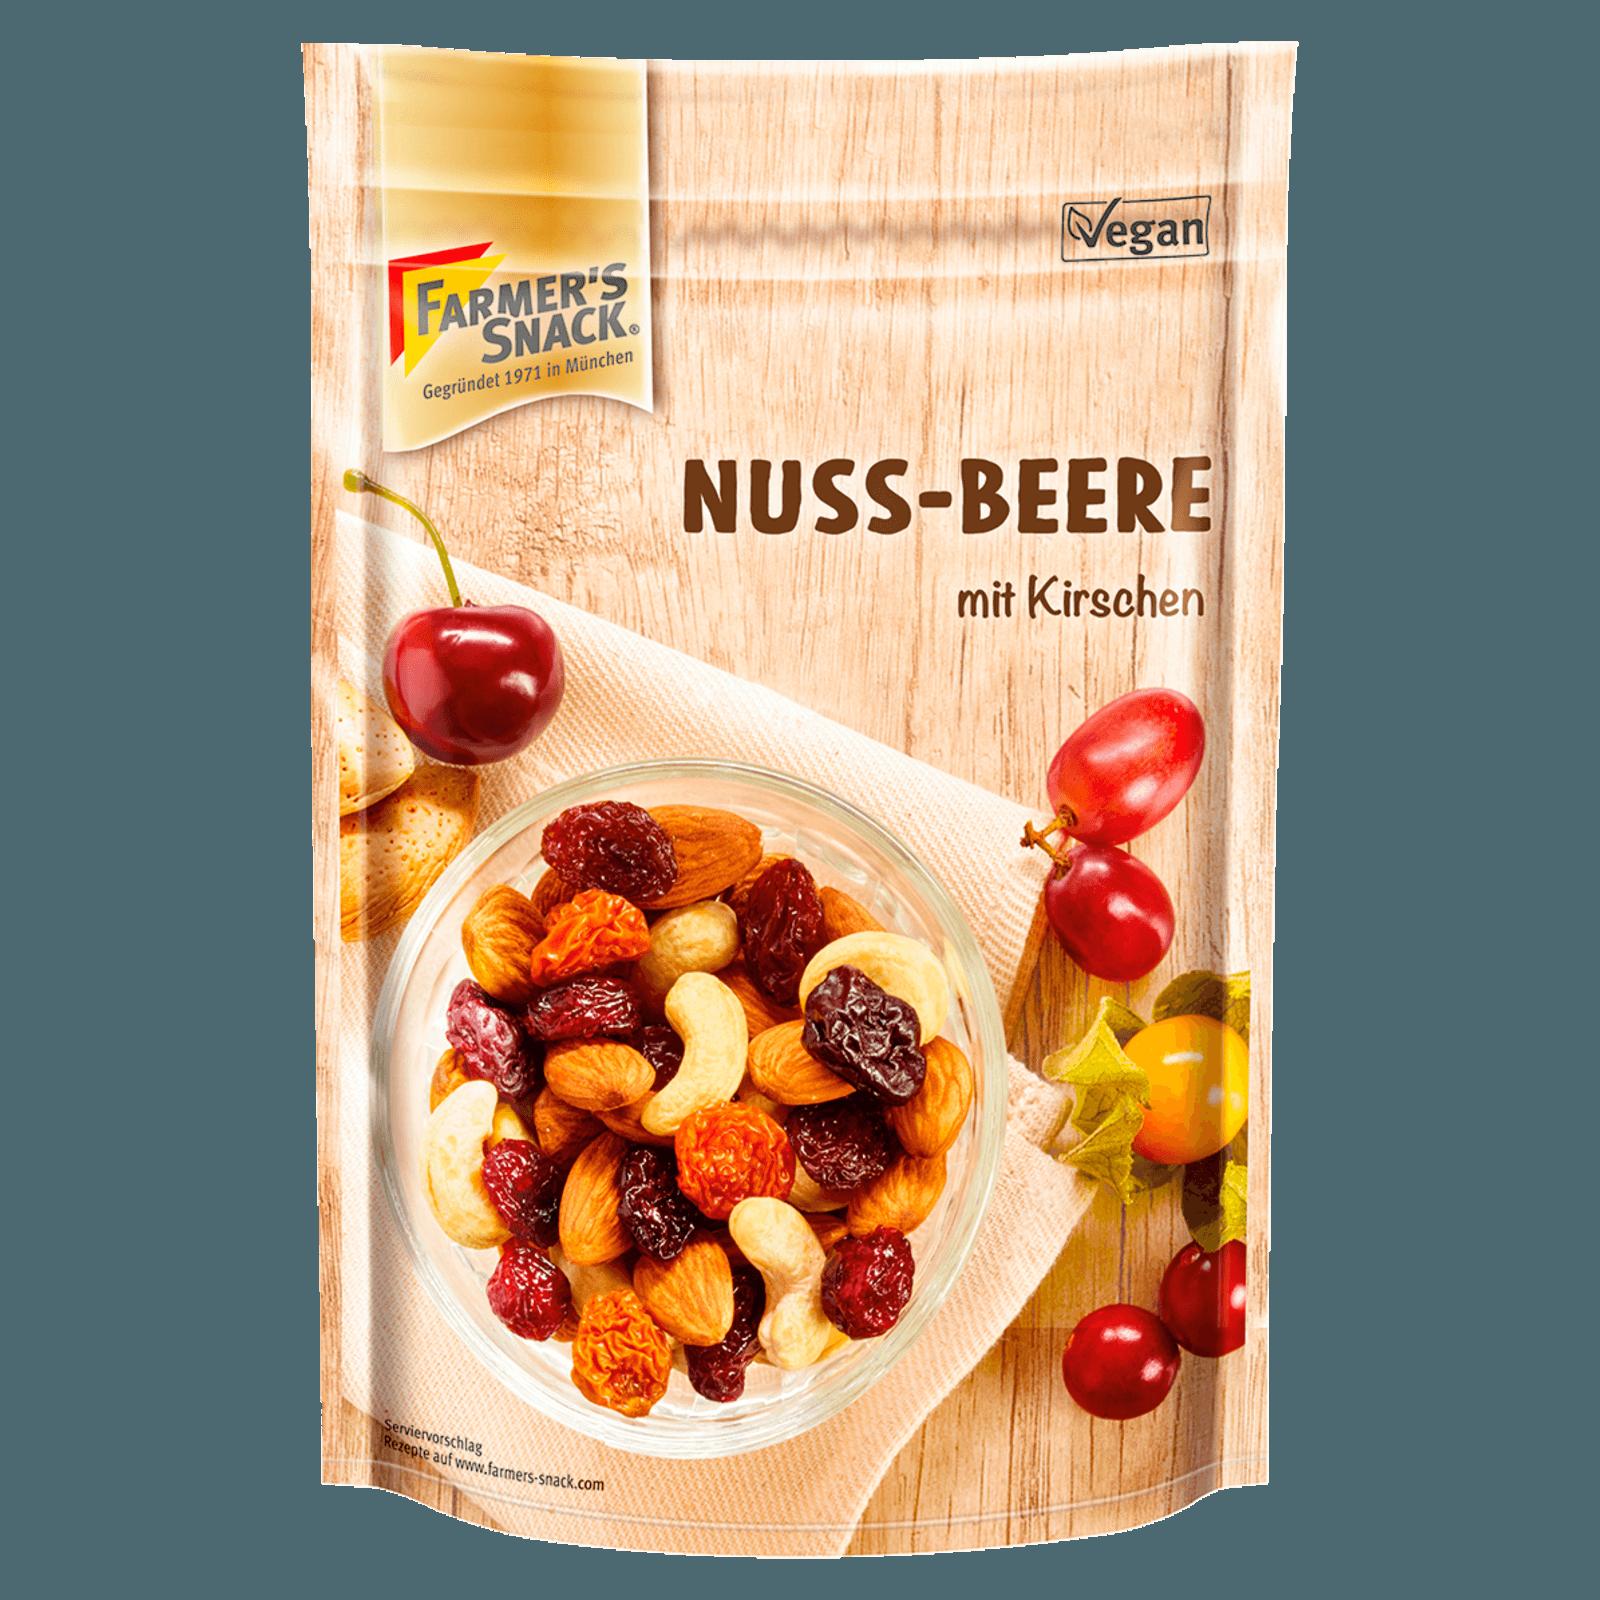 Farmer's Snack Nuss-Beeren mit Kirschen 175g